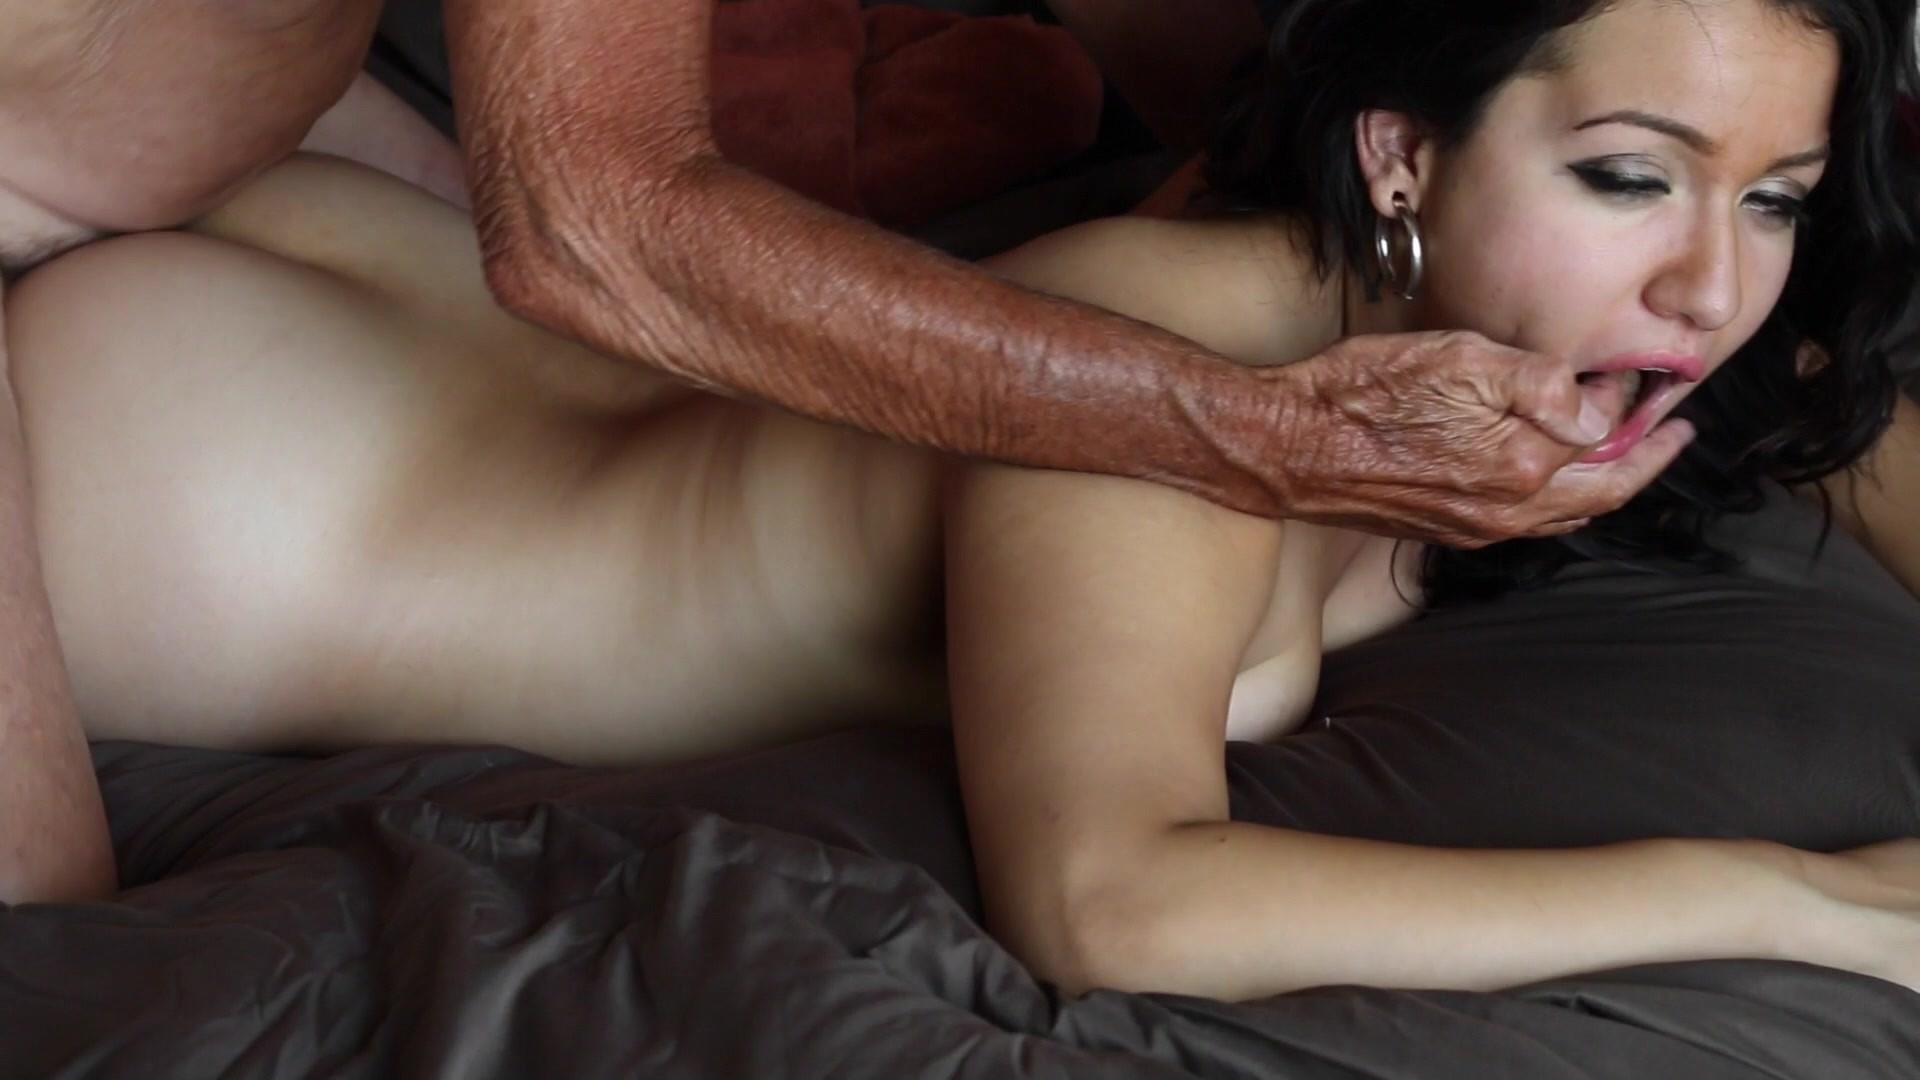 Very hot hollywood porn girl